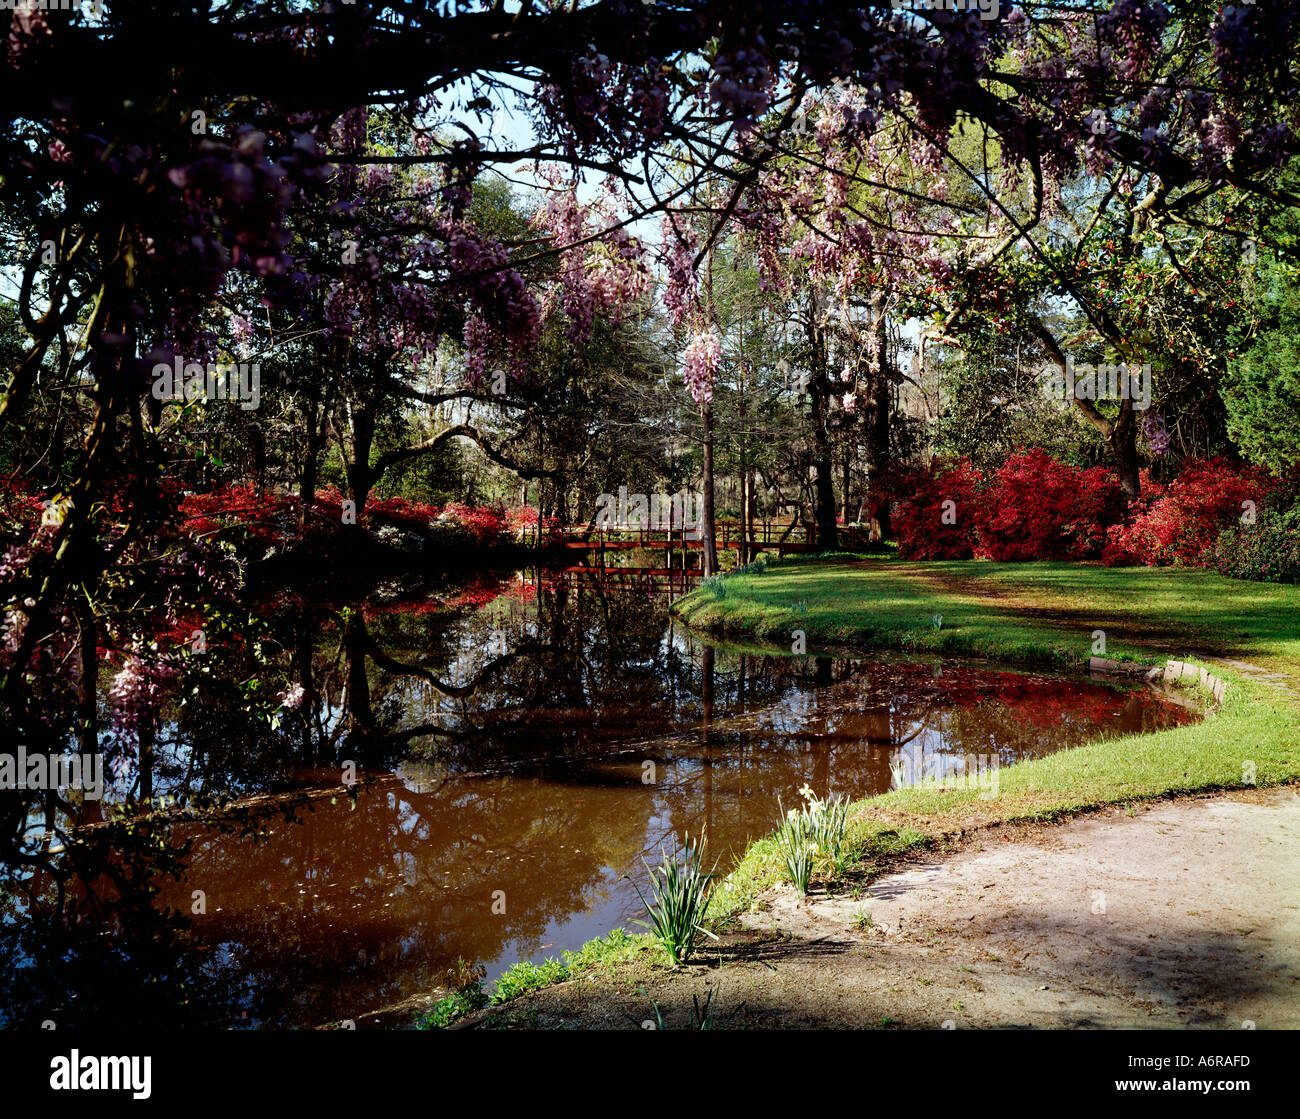 Magnolia Gardens Near Charleston In South Carolina With A Small Pond Stock Photo Royalty Free